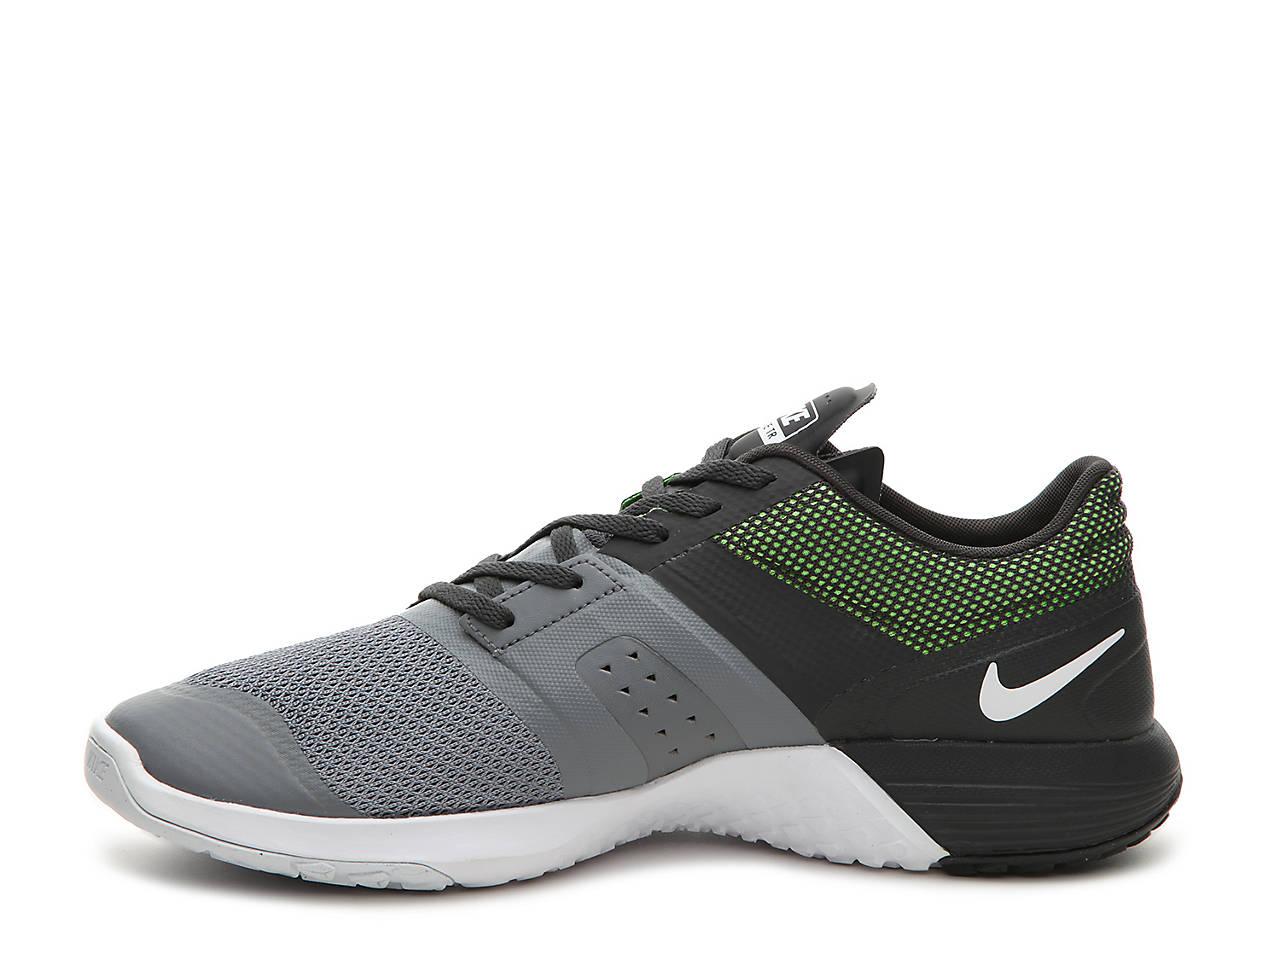 d6fc8813c197 ... usa free trainer 5.0 dsw nike fs lite trainer 3 training shoe mens  5838d 0370b